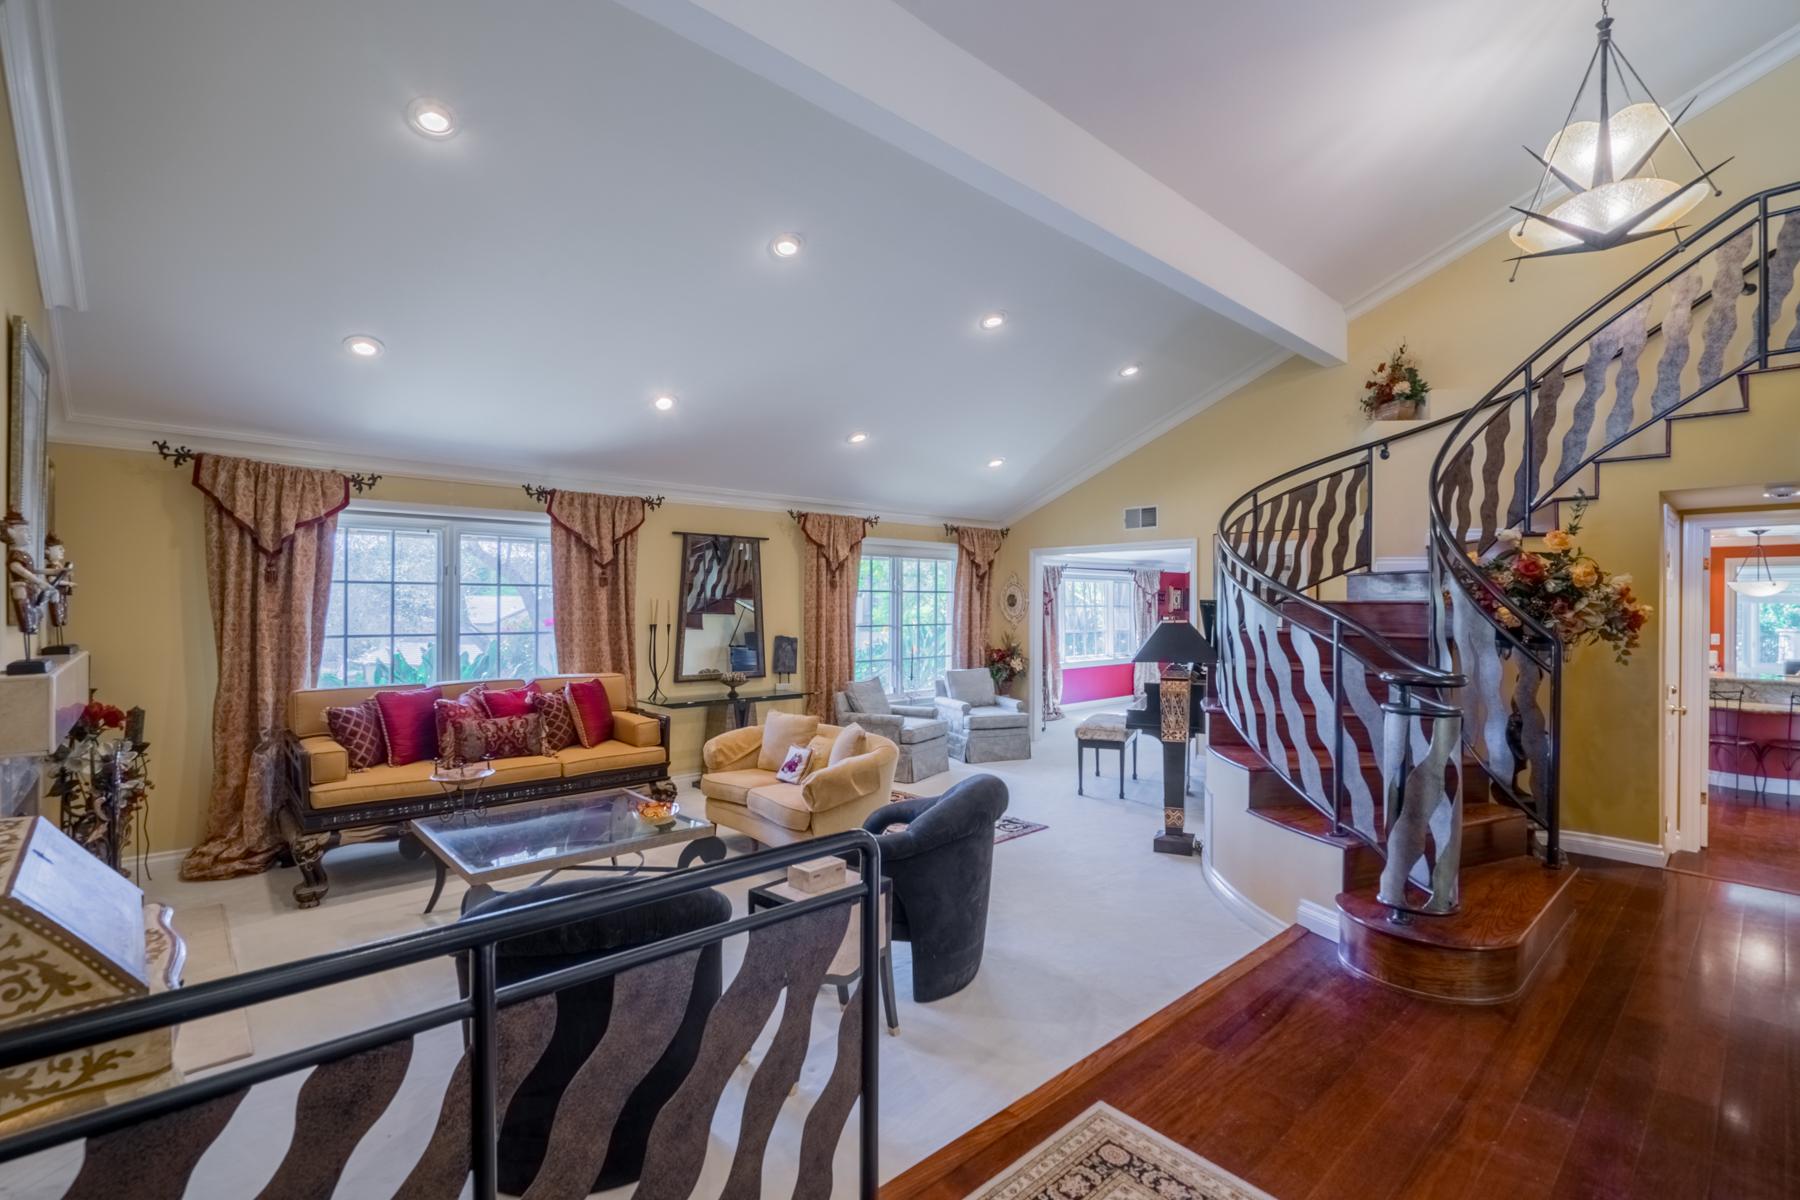 Single Family Home for Sale at 12376 Grandee 12376 Grandee Road Rancho Bernardo, San Diego, California, 92128 United States